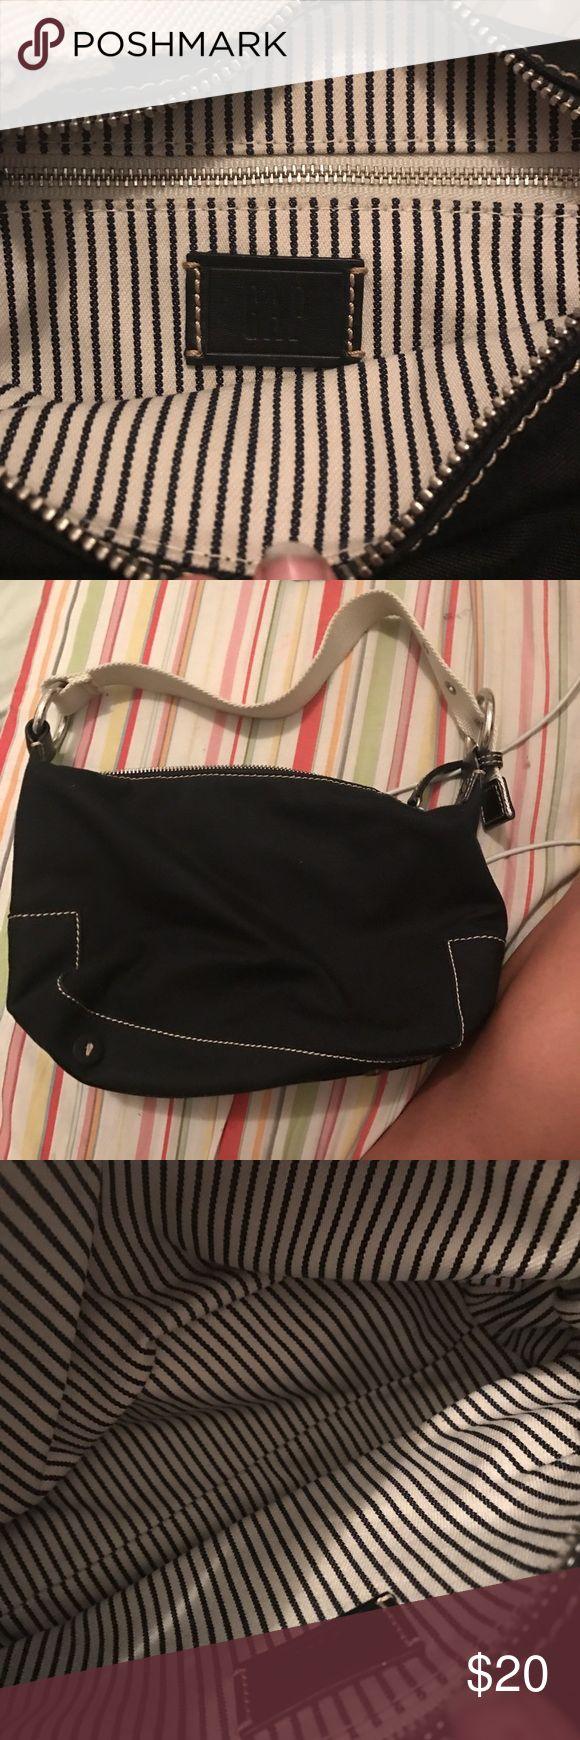 Black gap purse Amazing condition GAP Bags